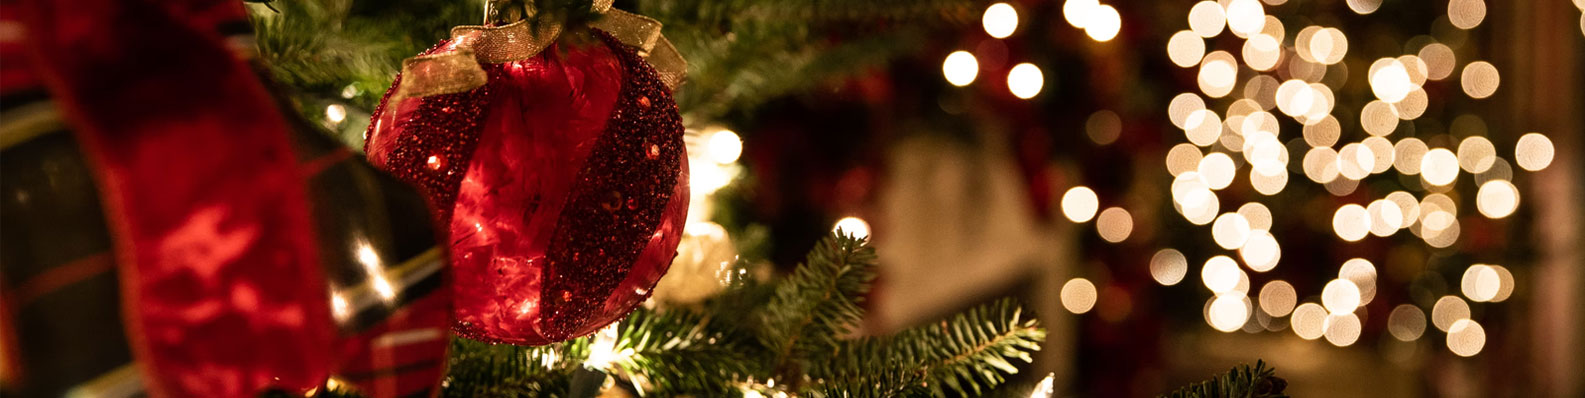 Organize Christmas Decorations Workshops